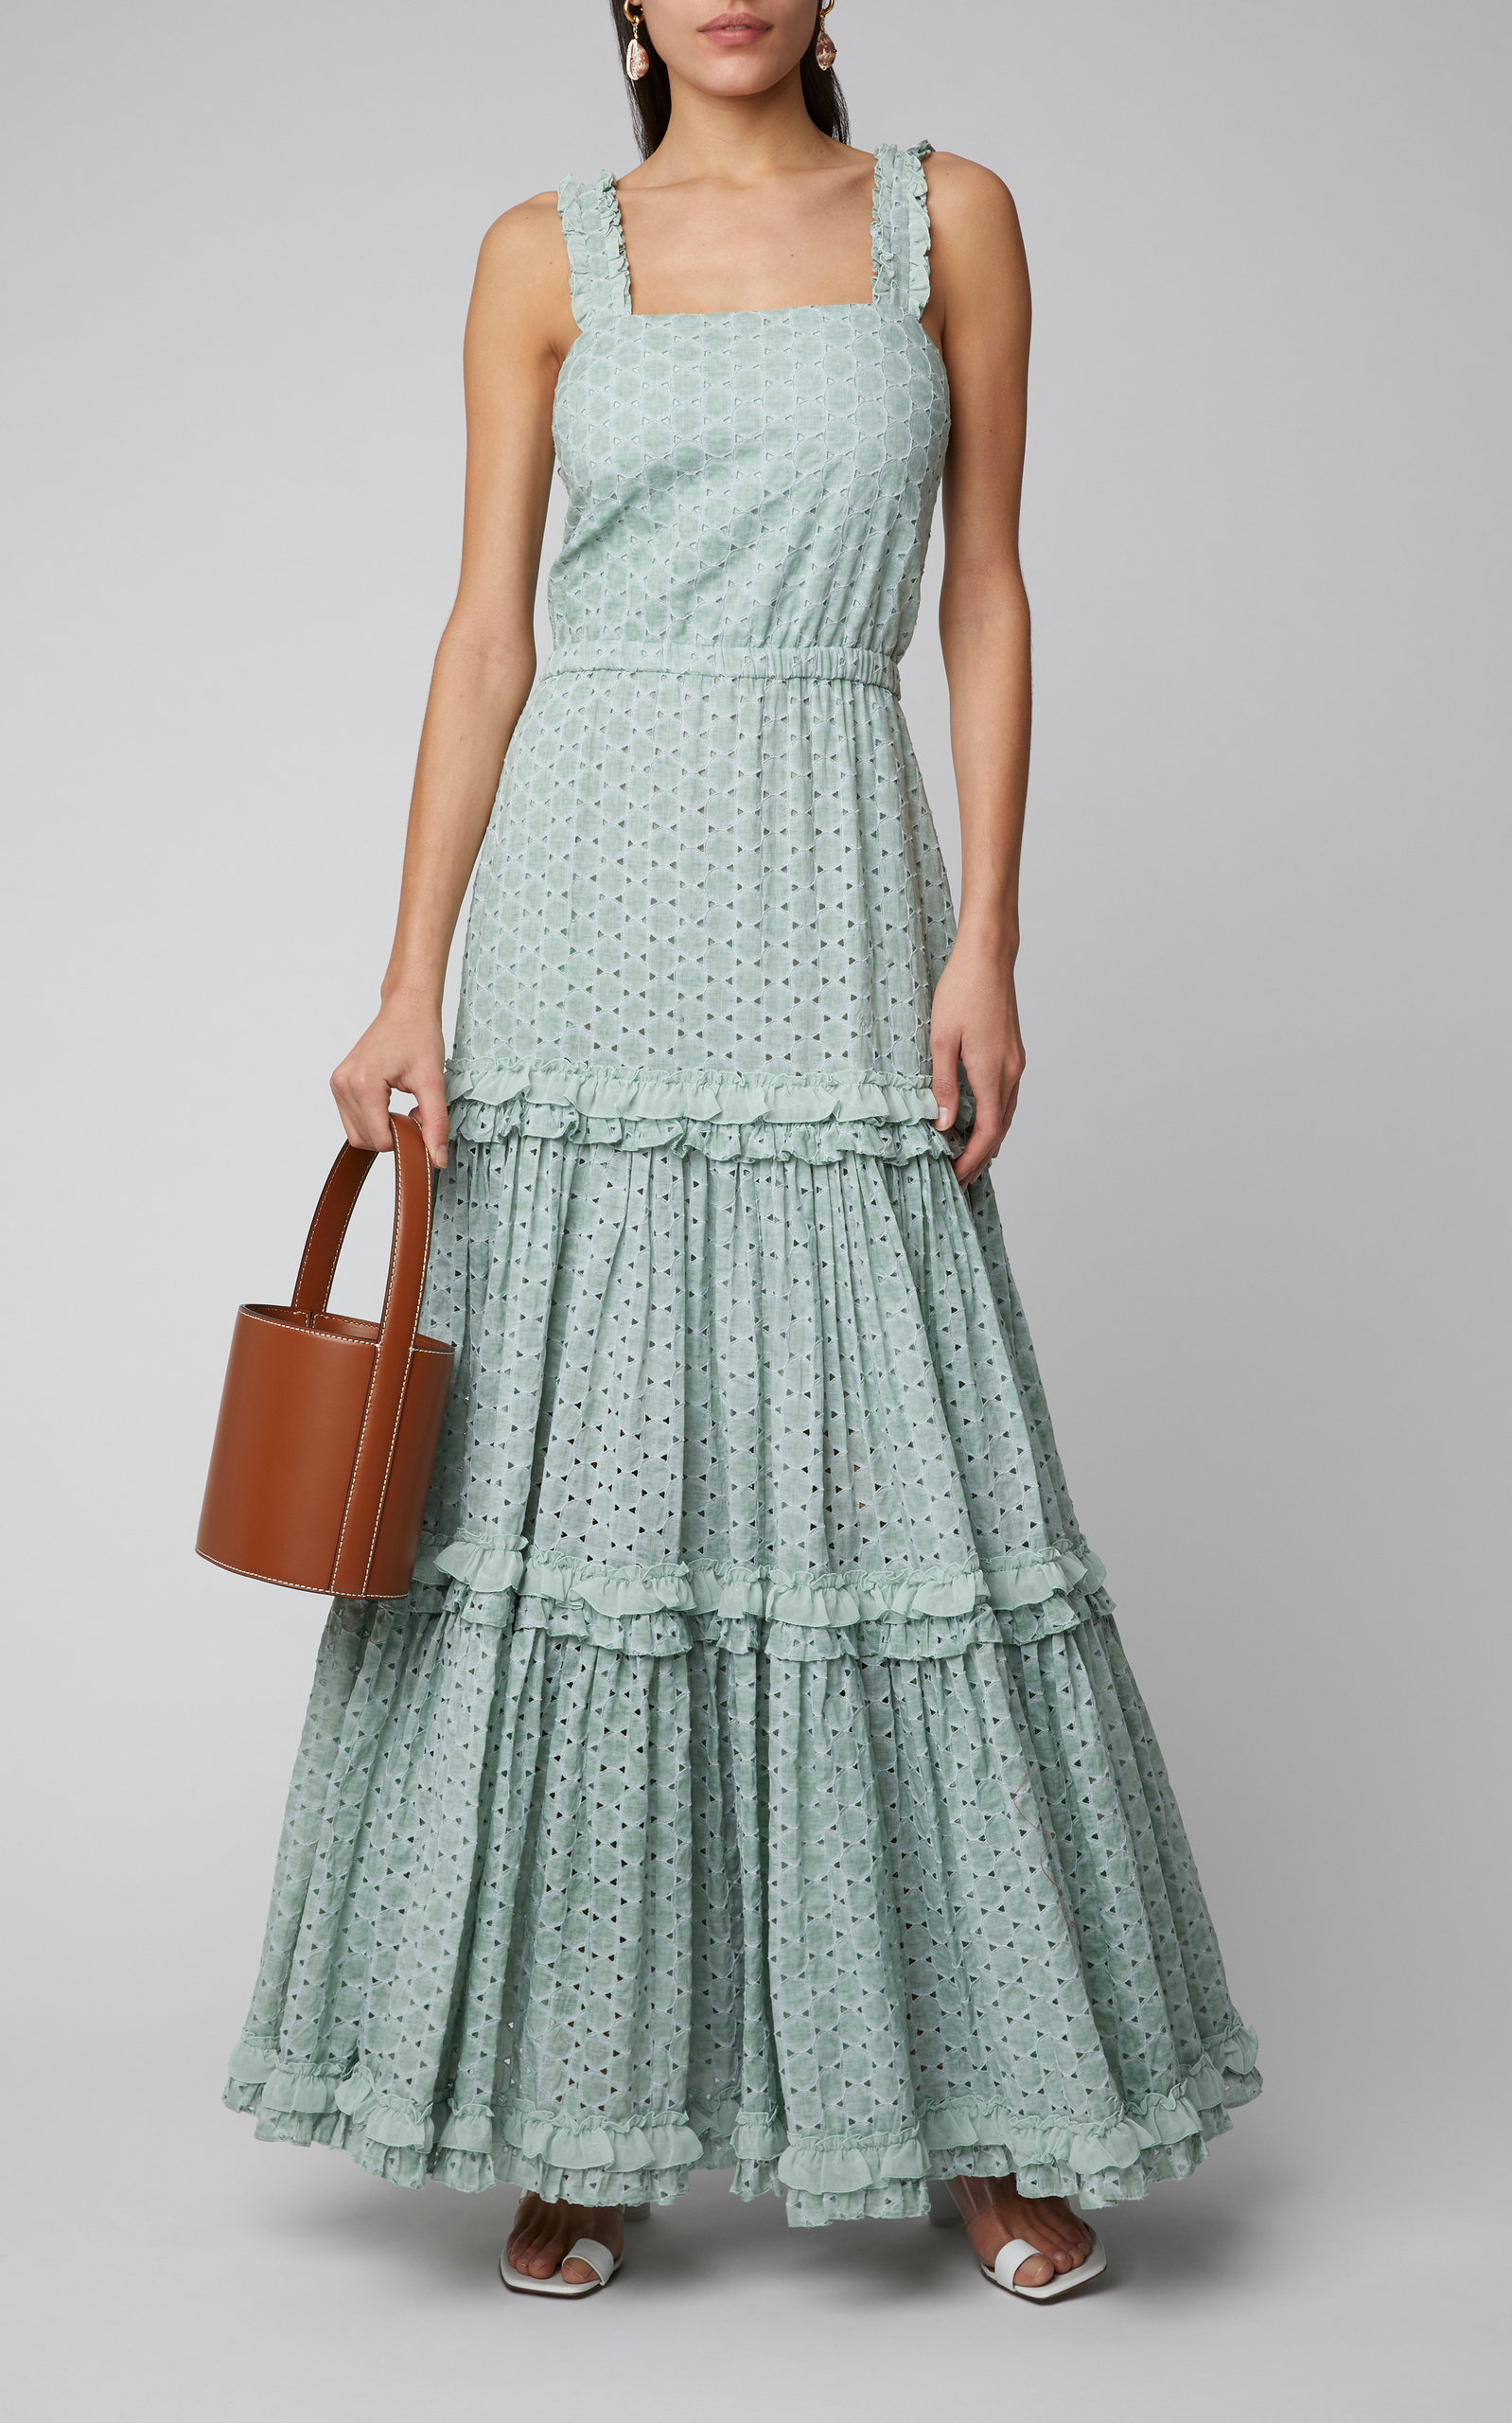 1d2a99398850 AlexisMilada Ruffled Broderie Anglaise Cotton Maxi Dress. CLOSE. Loading